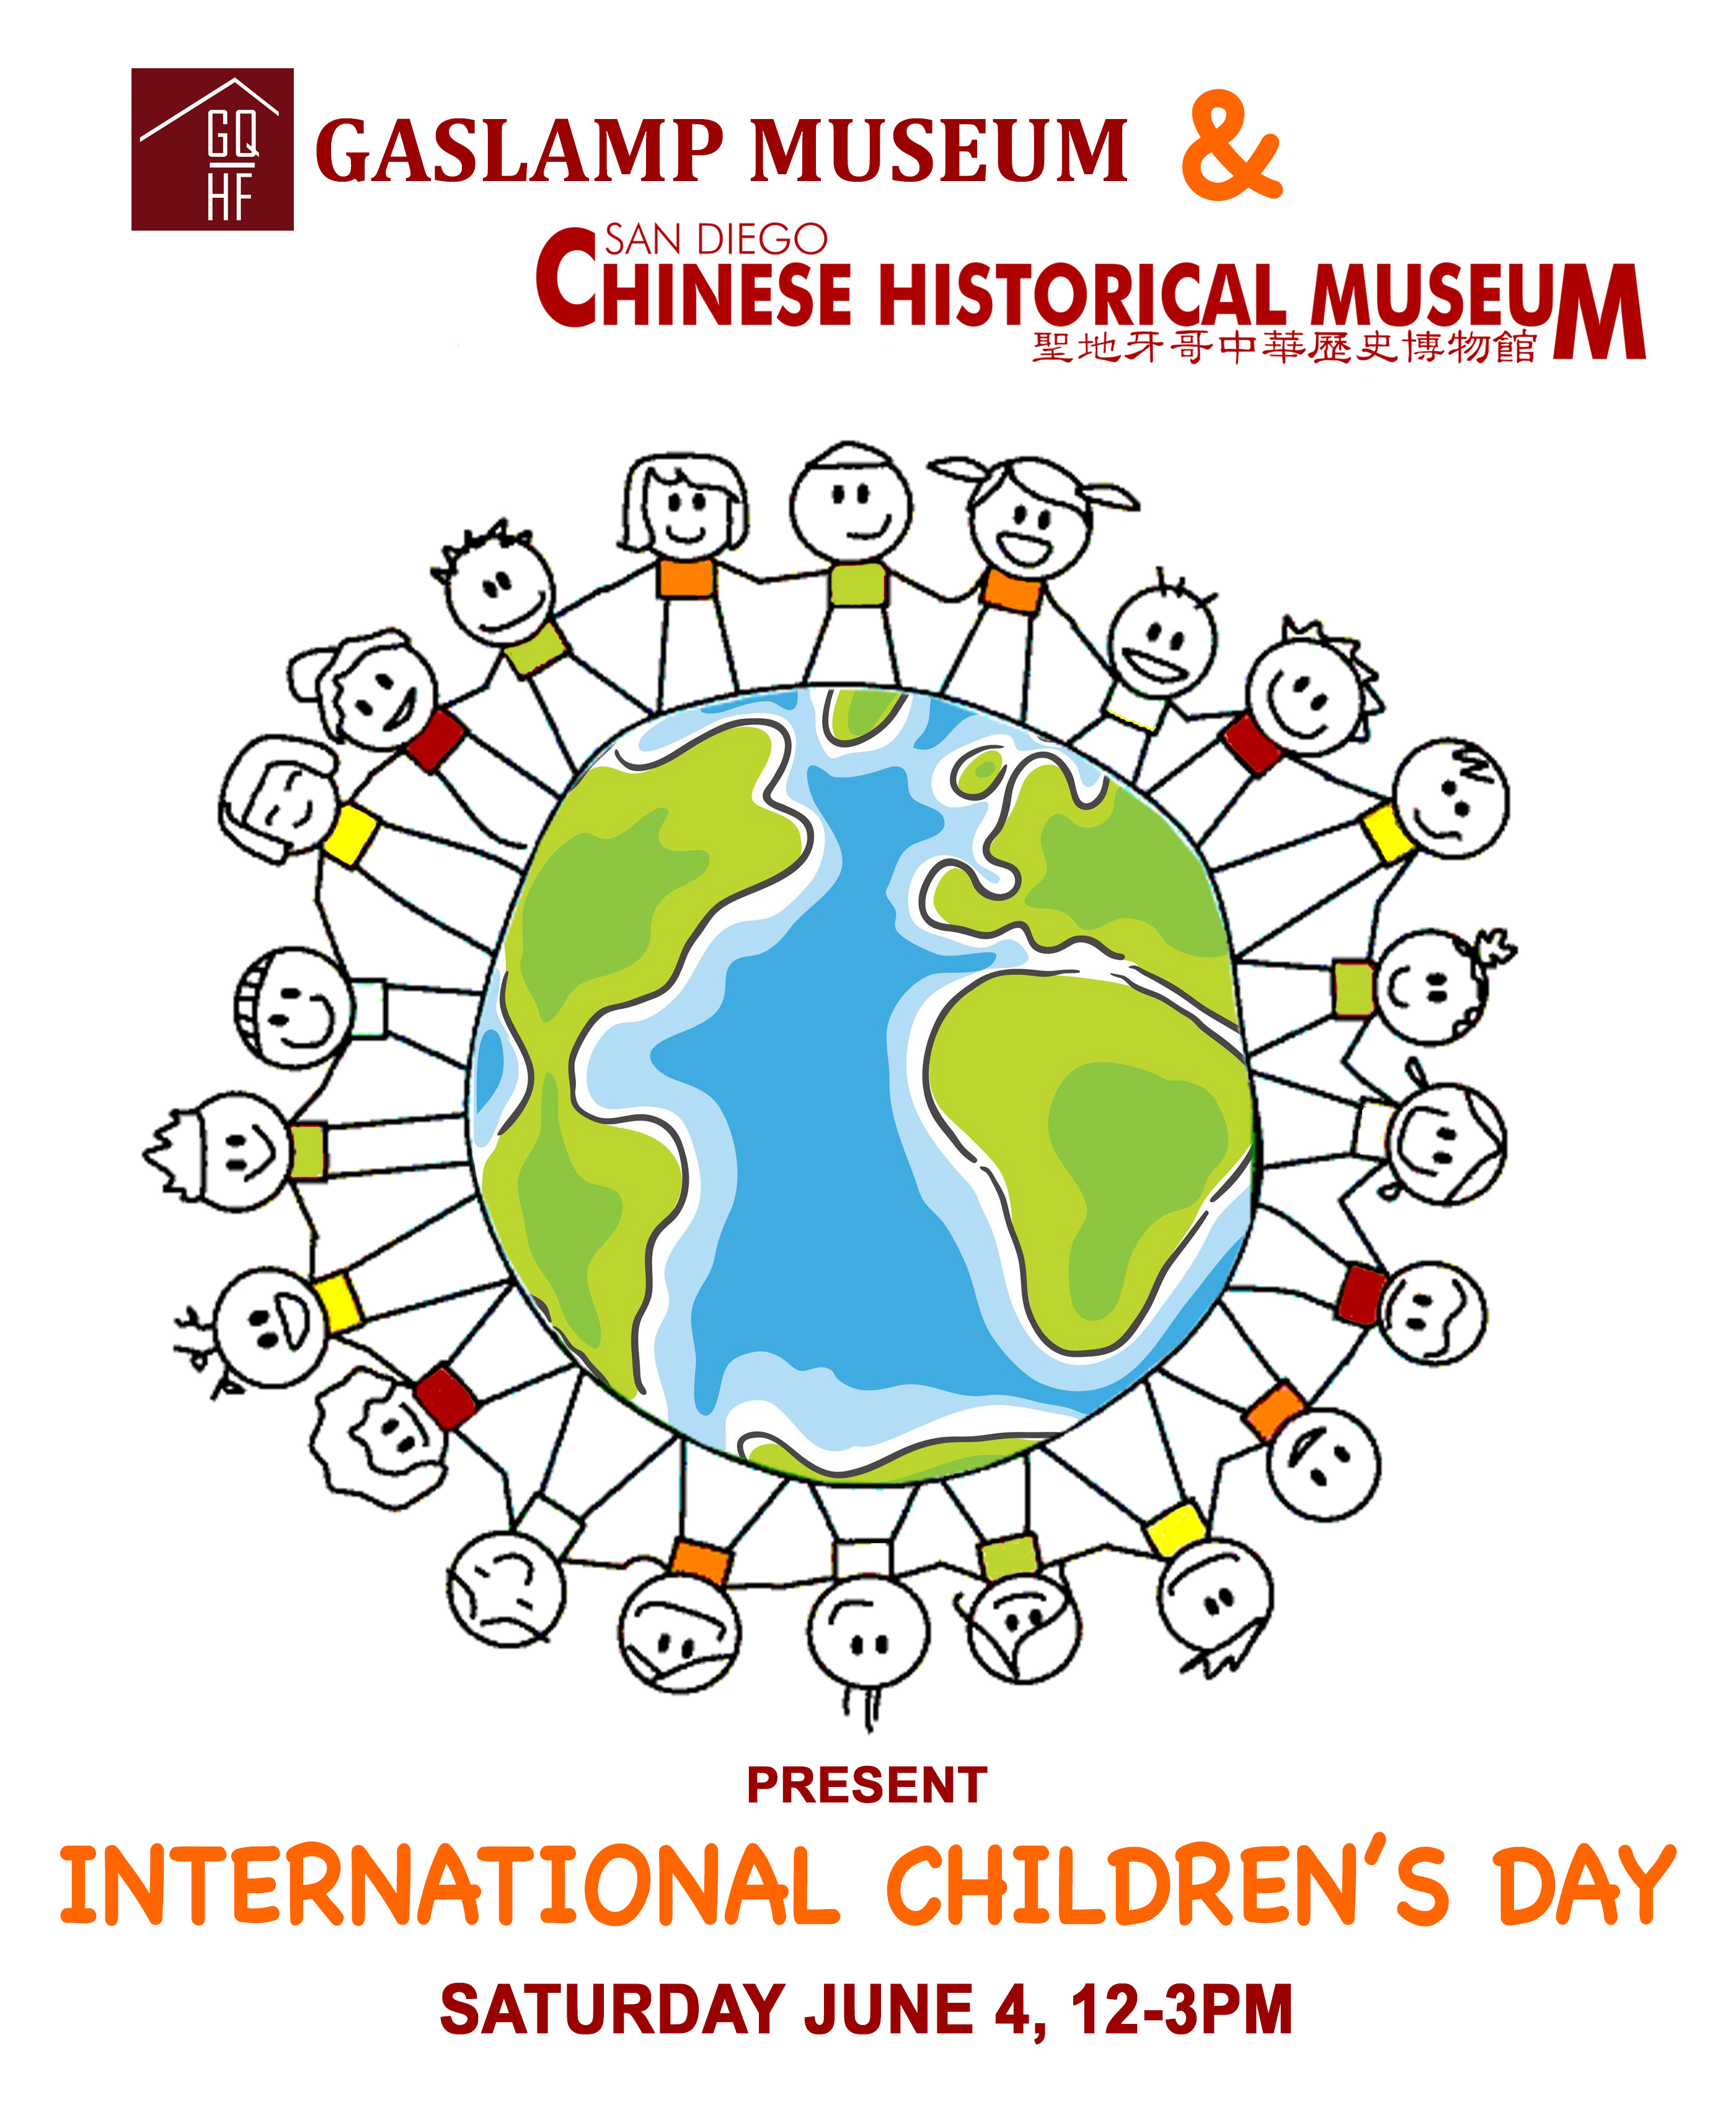 International Children's Day - Saturday, June 4, 2016 ...